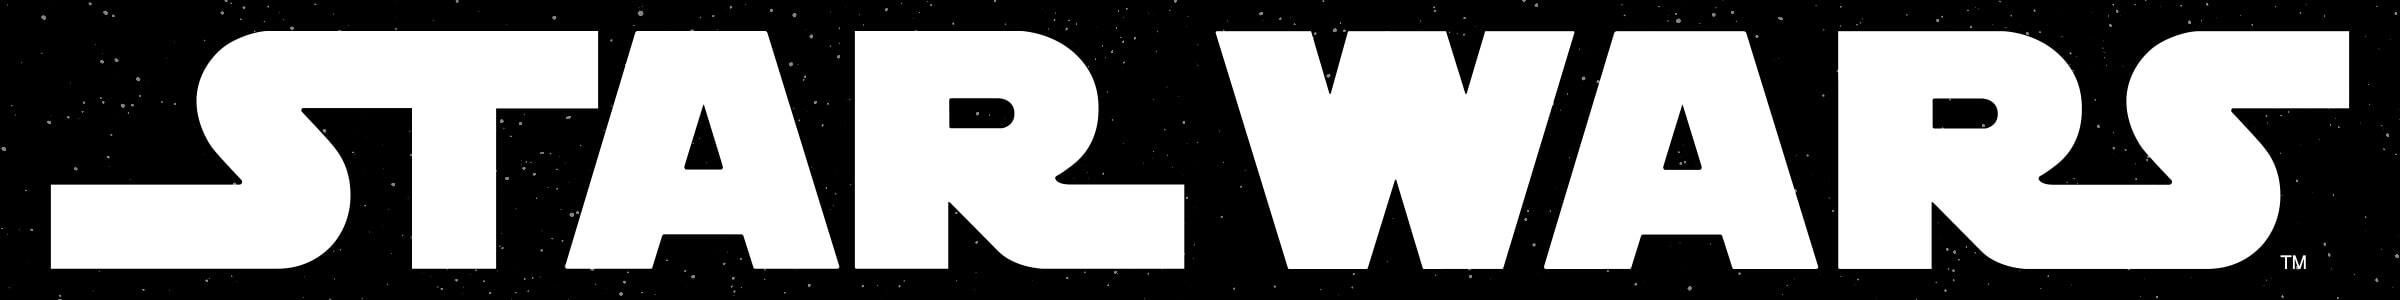 Category_Teaser_Header_Star_Wars_2_2400x300